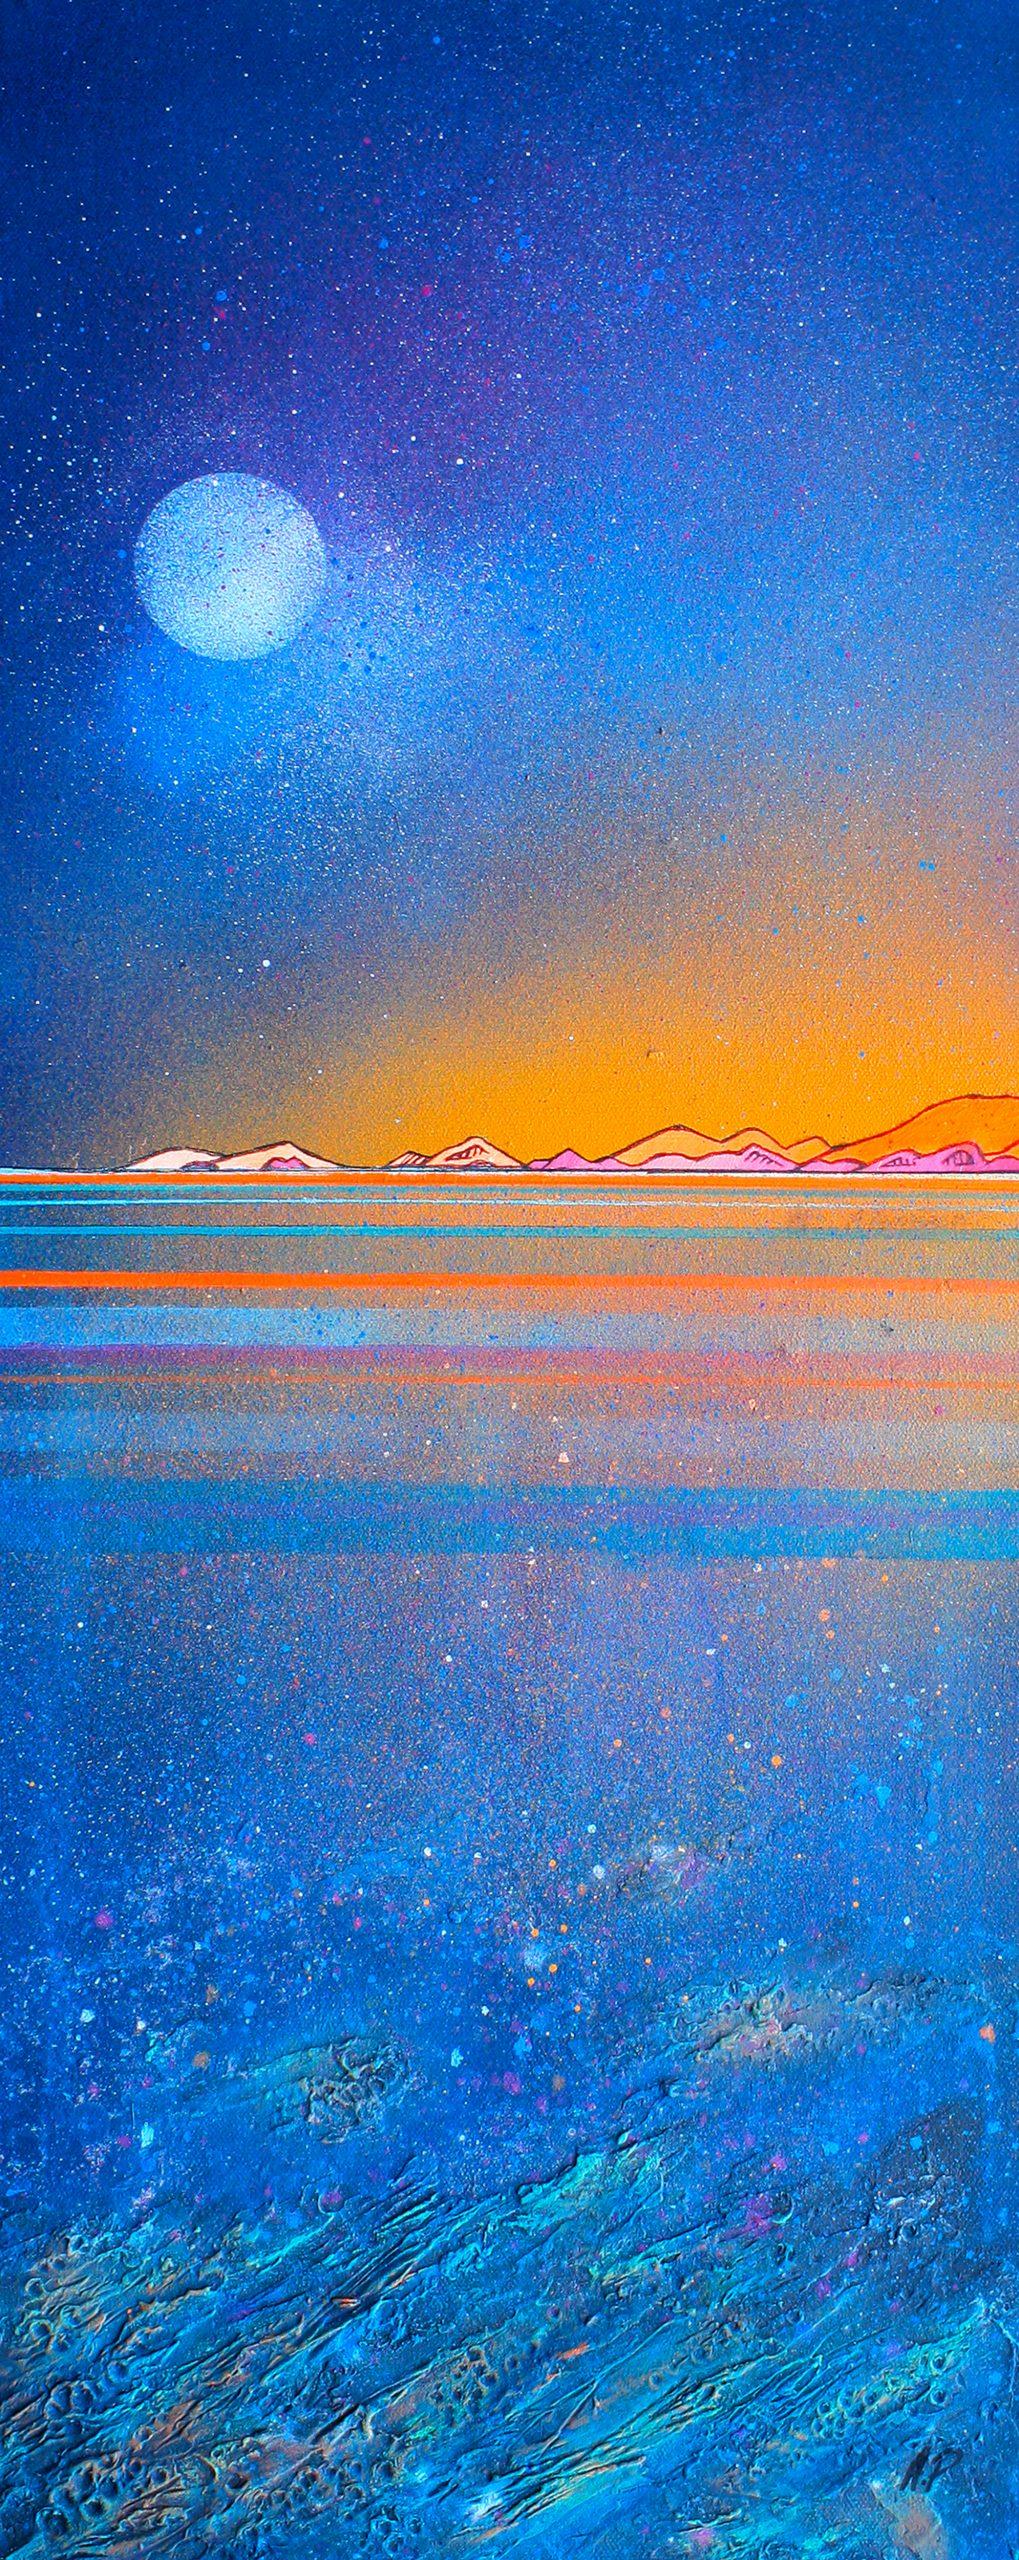 Coral Beach, Skye, Scottish Hebrides - Original canvas painting & art prints